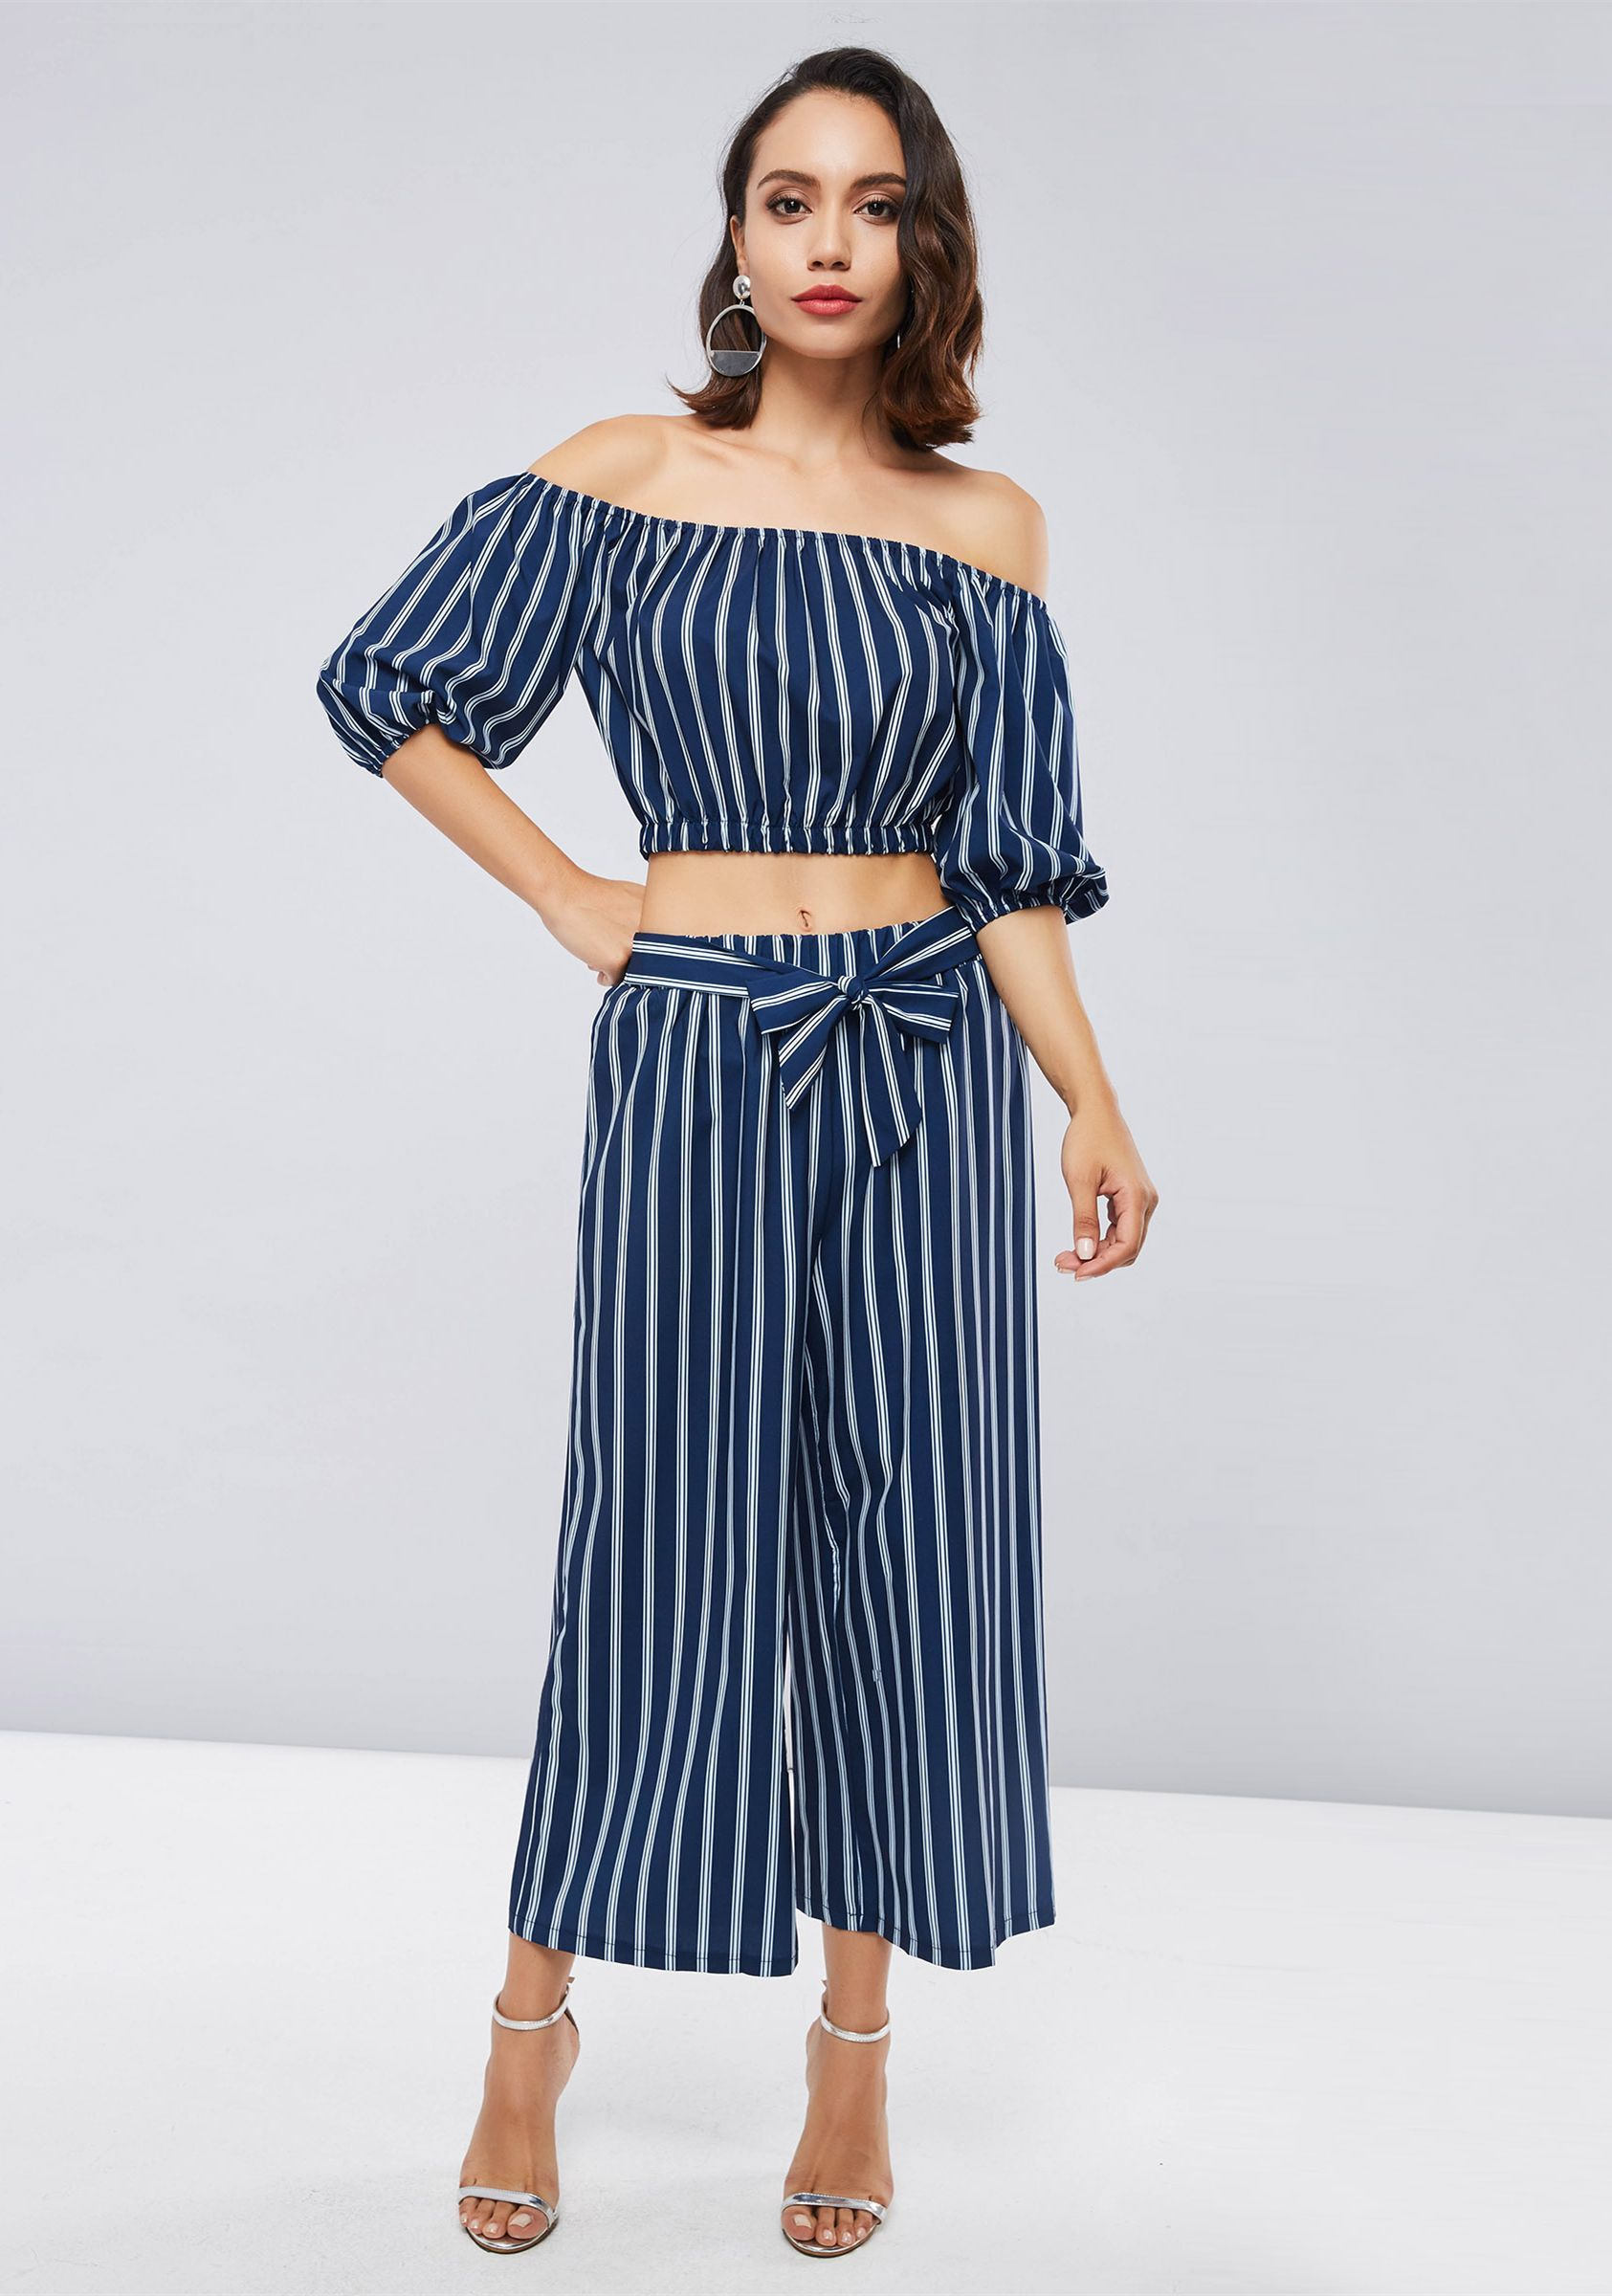 537d5b25ad265c Stripe Off Shoulder Tank Top and Pants Women s Two Piece Set